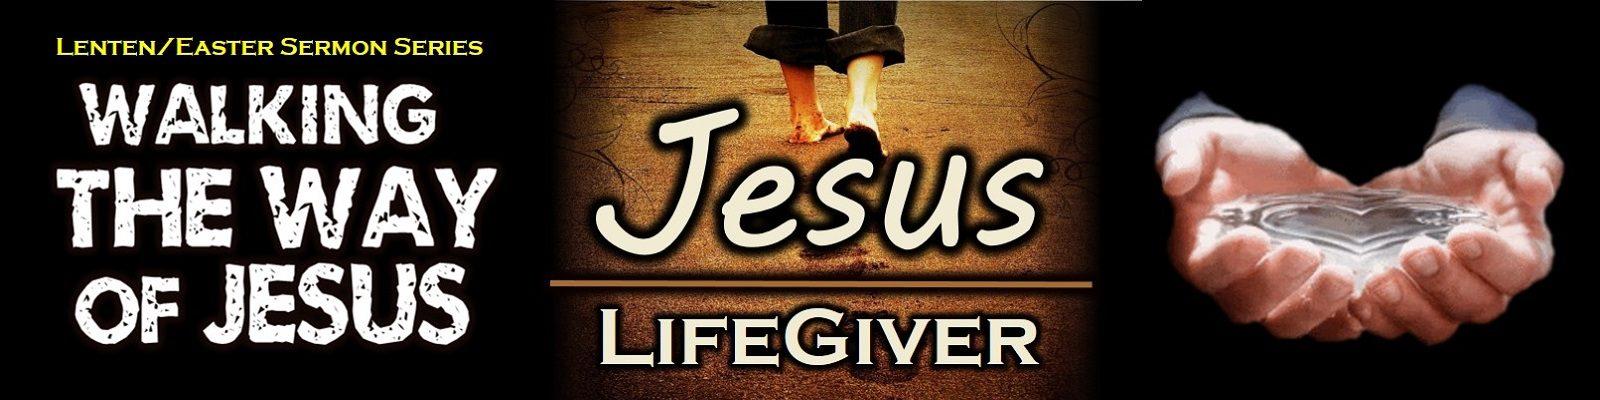 The Way Study #4 - Jesus Lifegiver